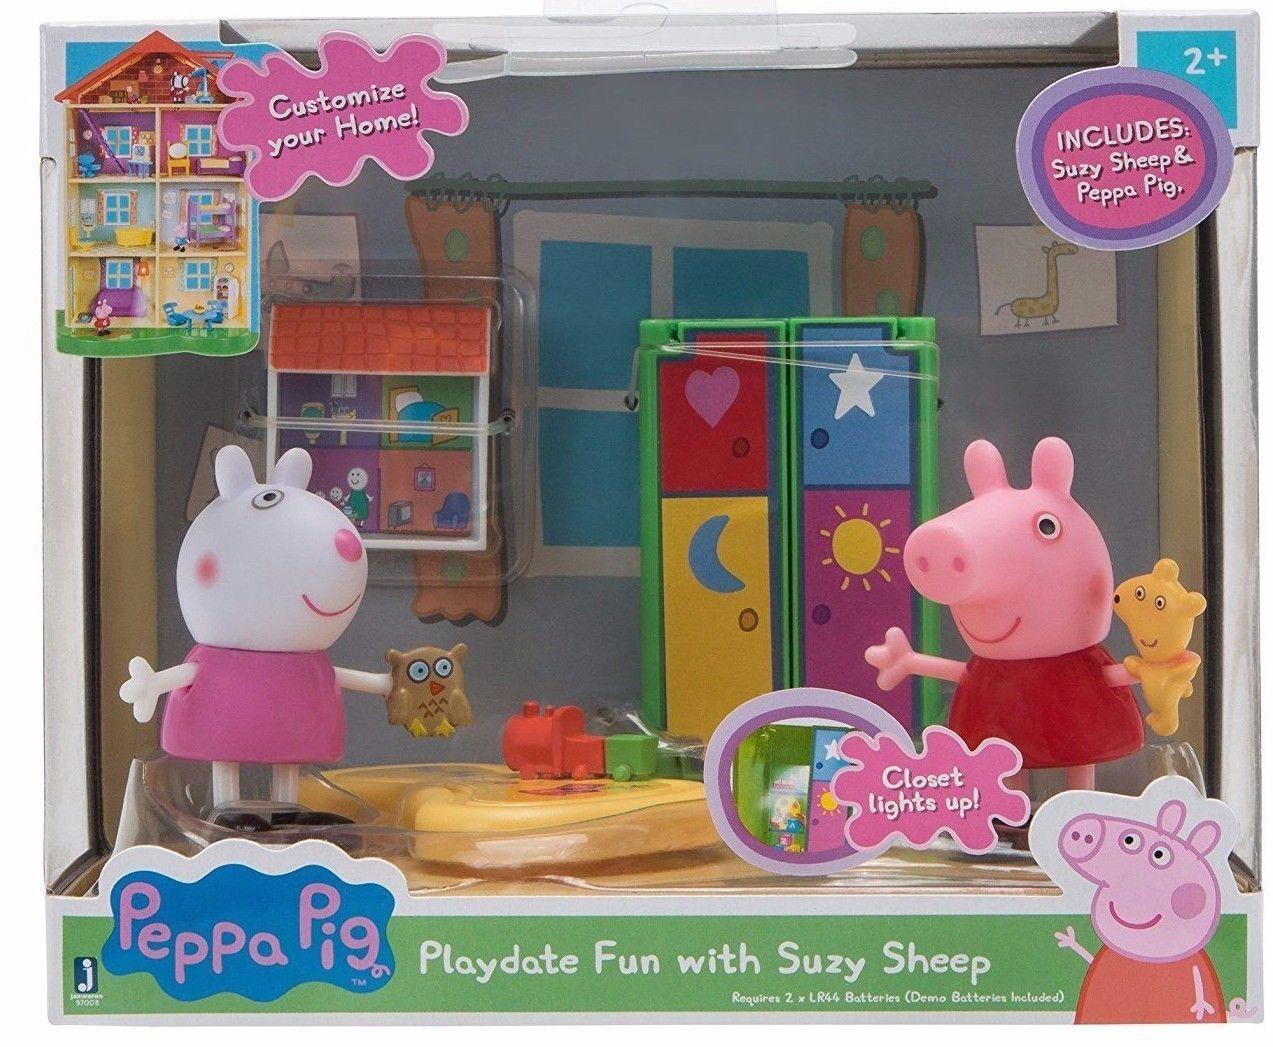 Playdate Fun w/ Suzy Sheep | Peppa pig toys, Little girl ...